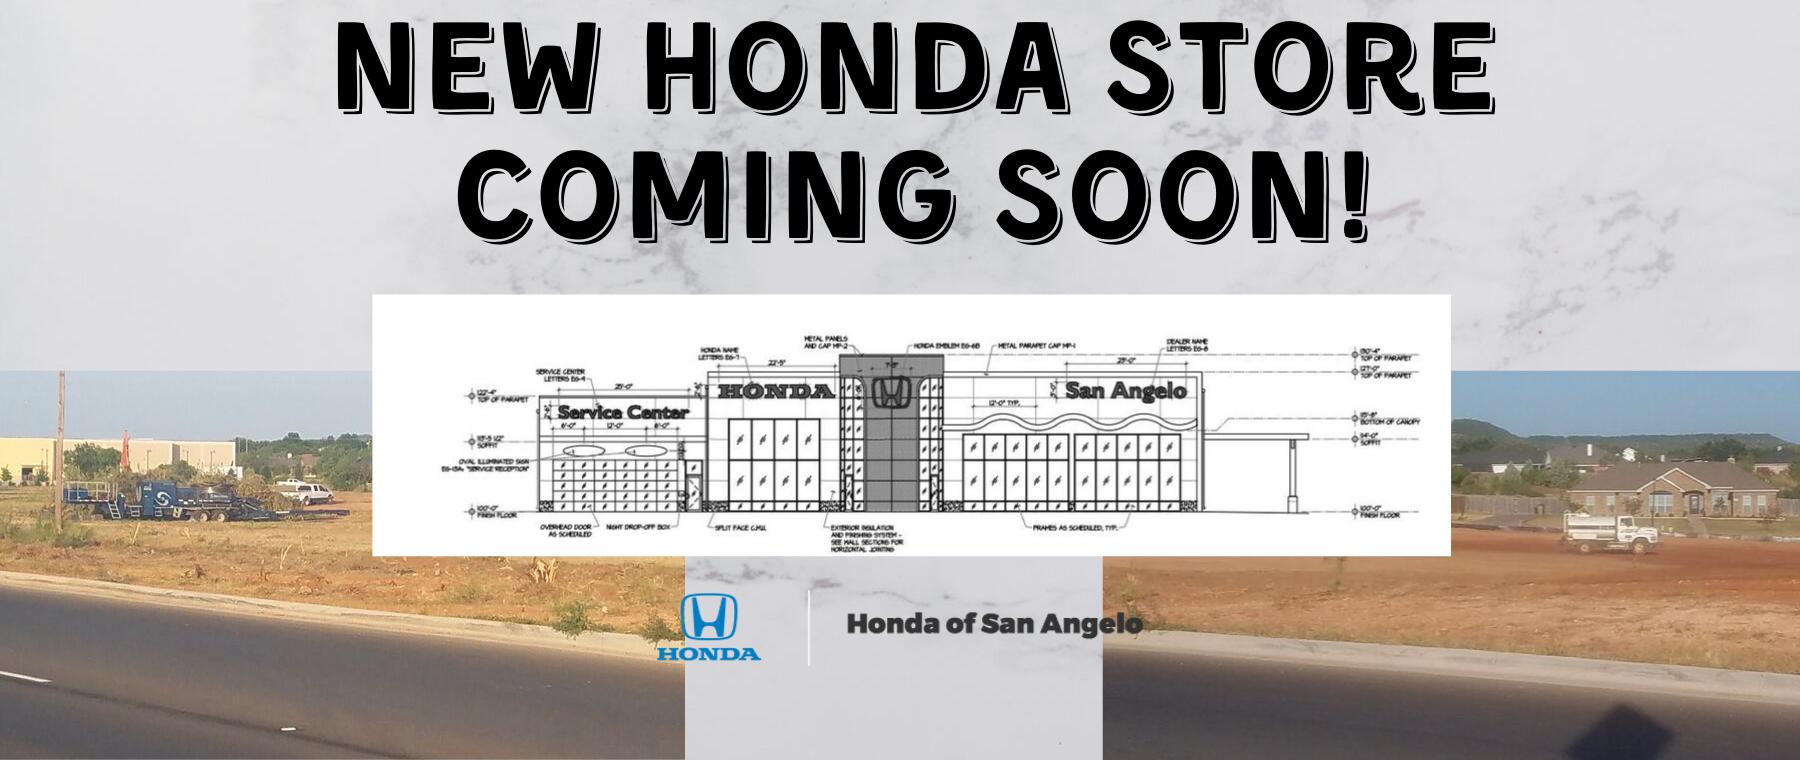 New Honda Store Coming Soon